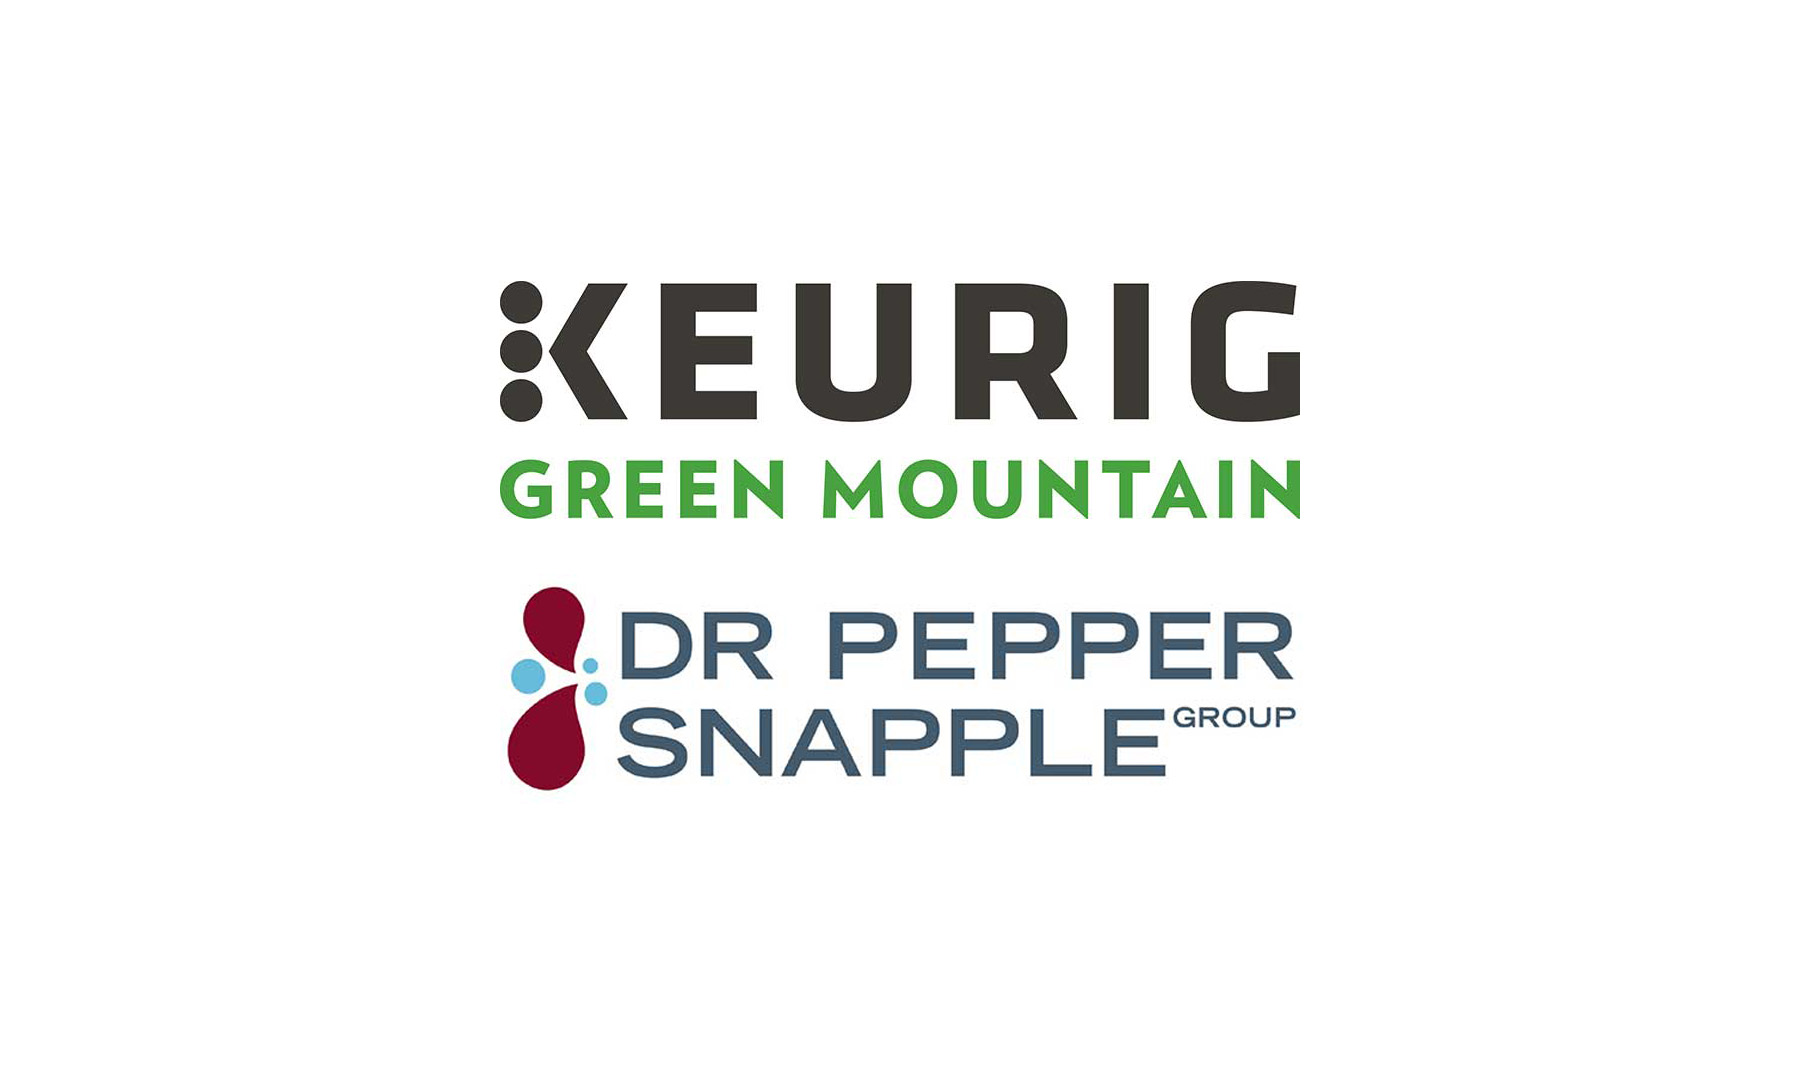 Keurig and Dr Pepper logos